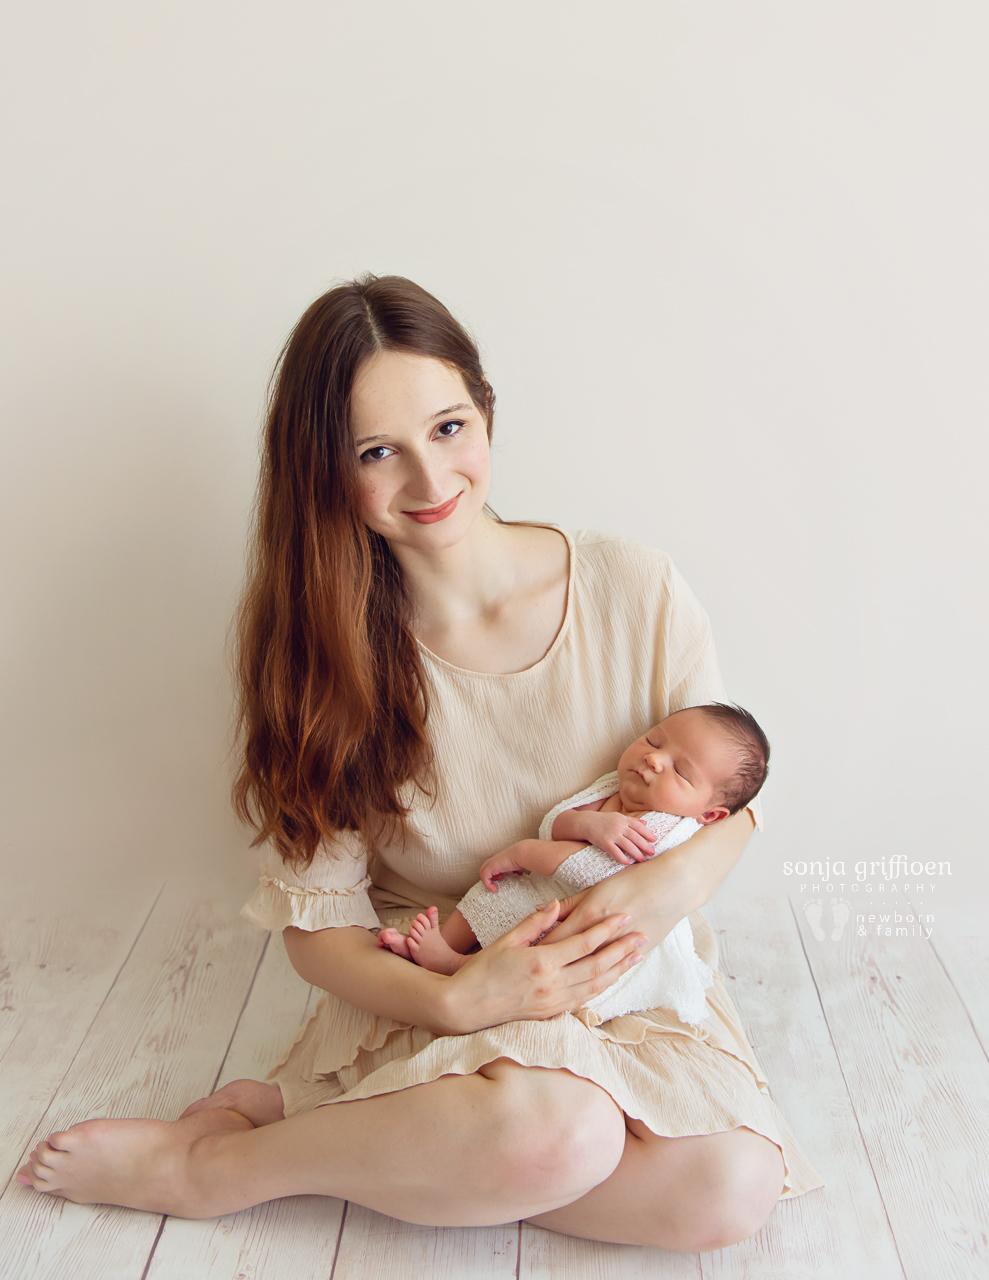 George-Newborn-Brisbane-Newborn-Photographer-Sonja-Griffioen-02.jpg